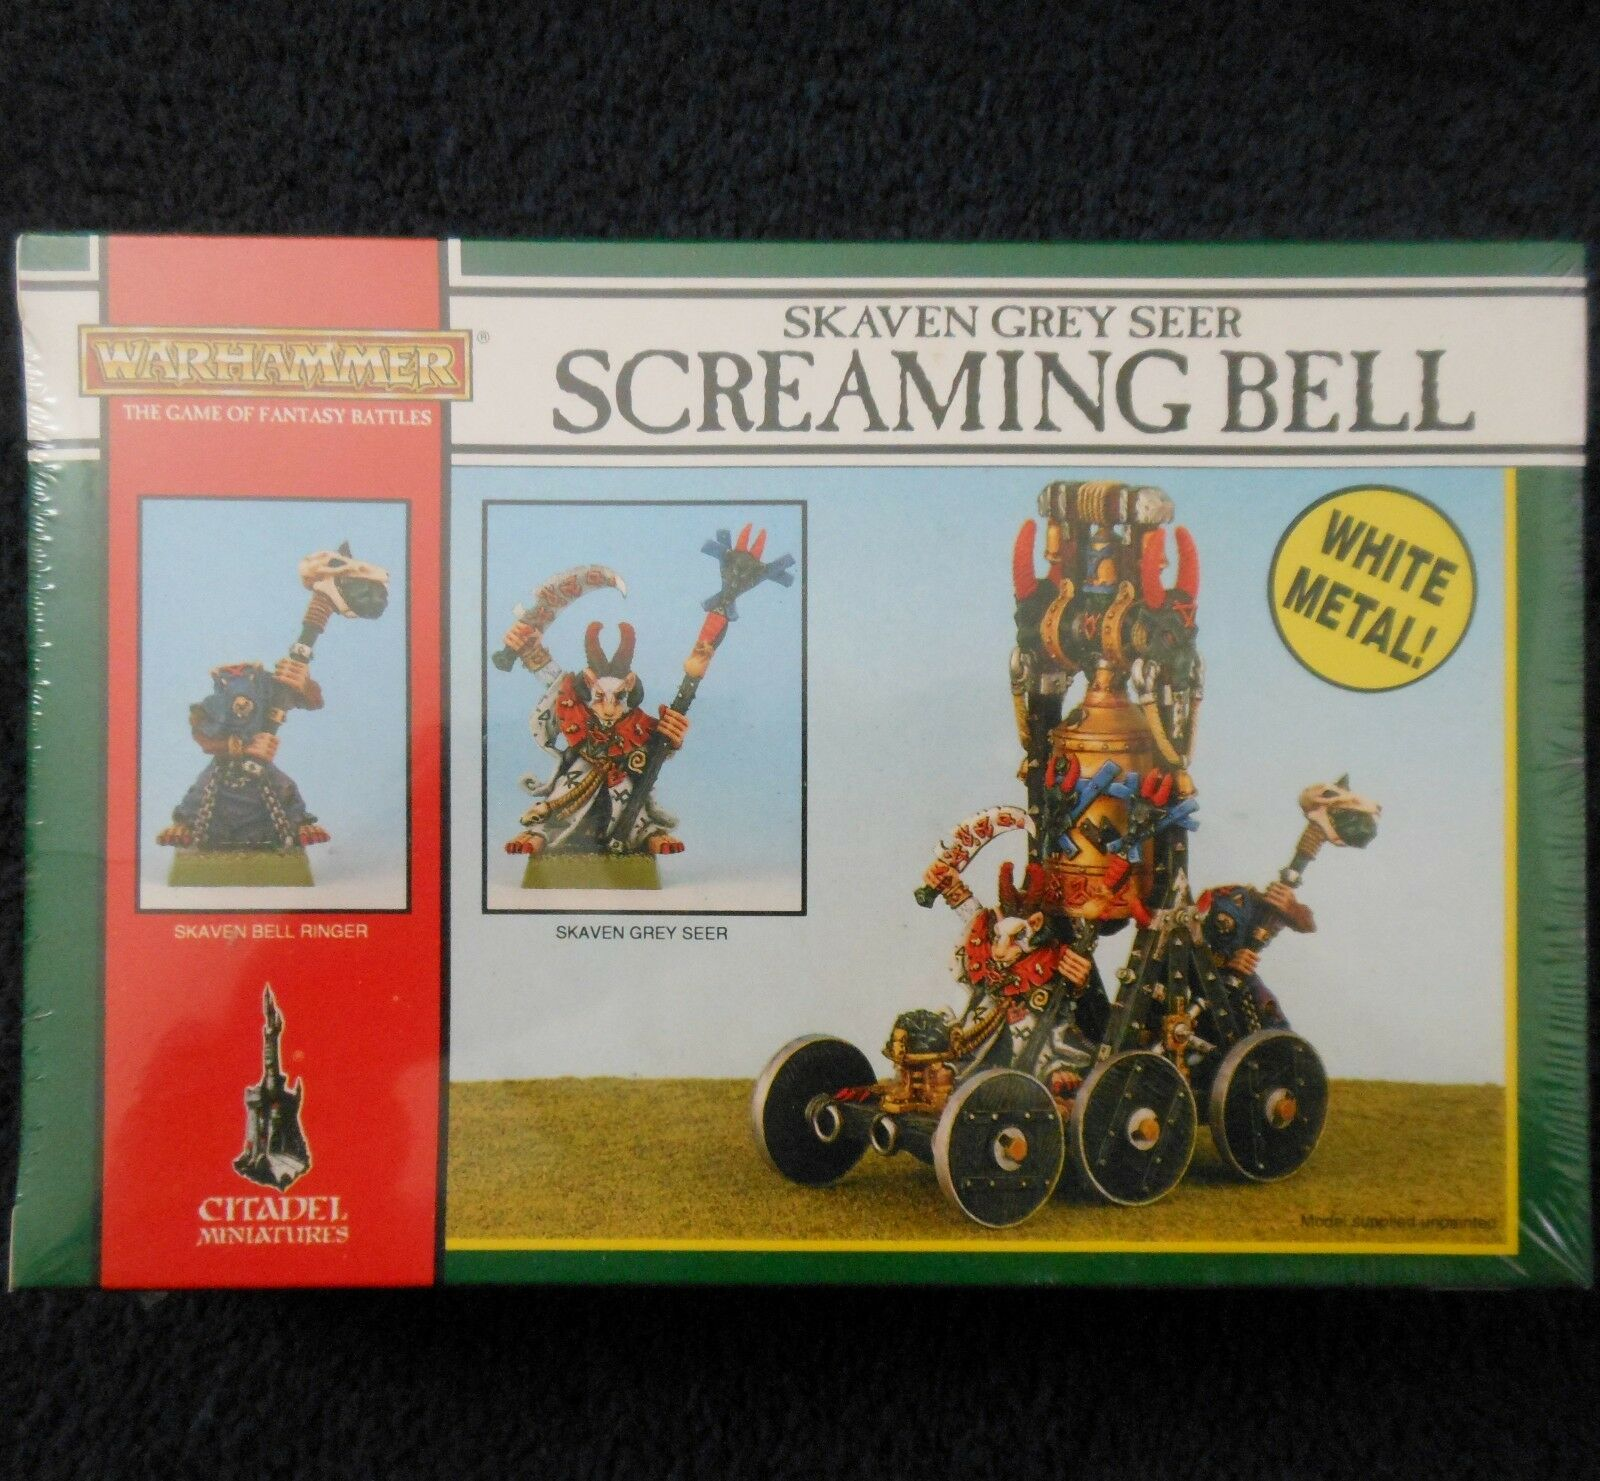 1993 Skaven Screaming Bell Chaos RatHommes Citadel Warhammer Army gris  Seer MIB GW  Nouvelle liste